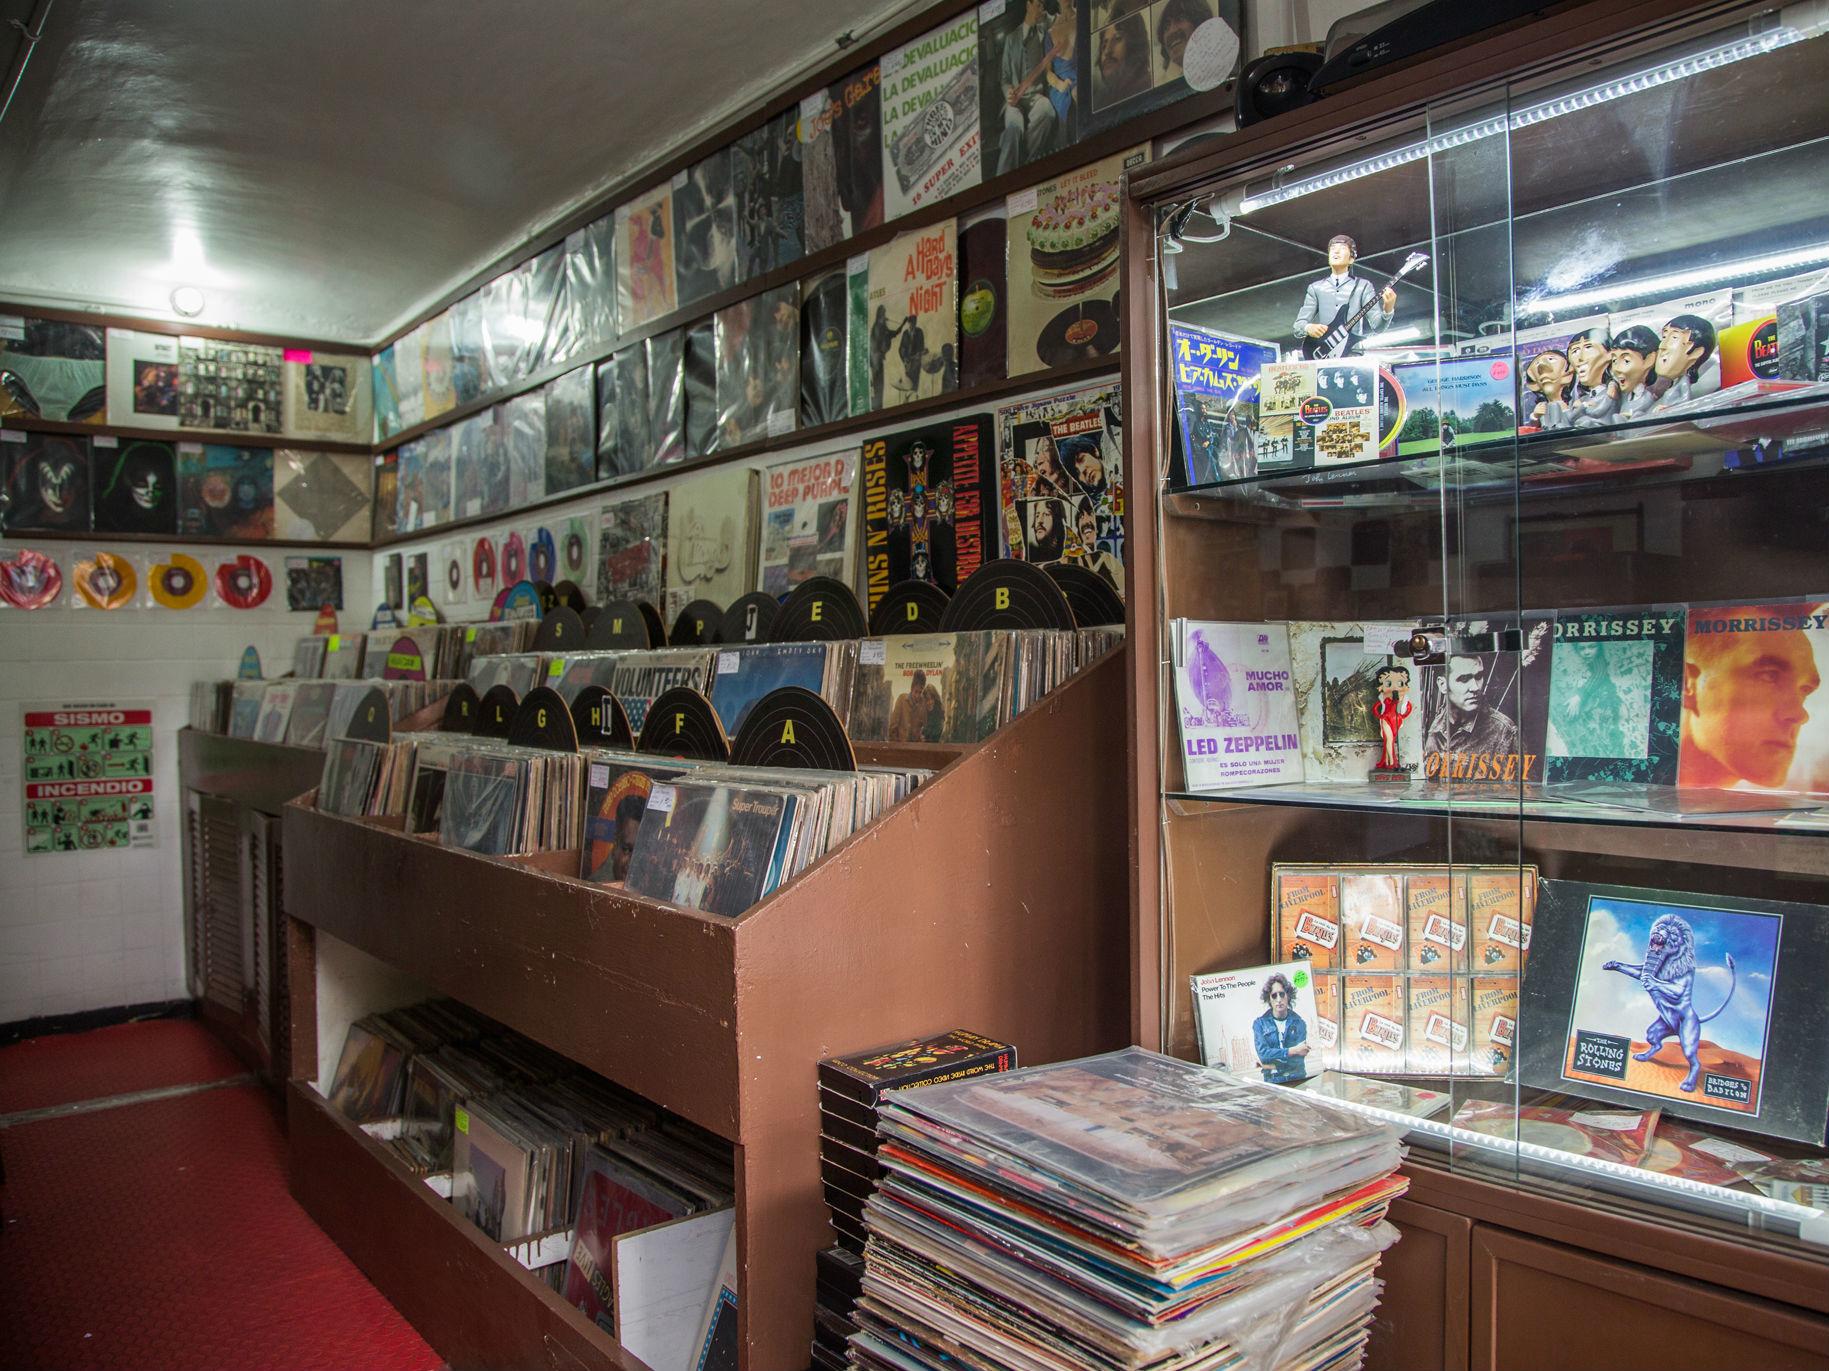 La Tienda Del Disco De Vinyl en la Roma